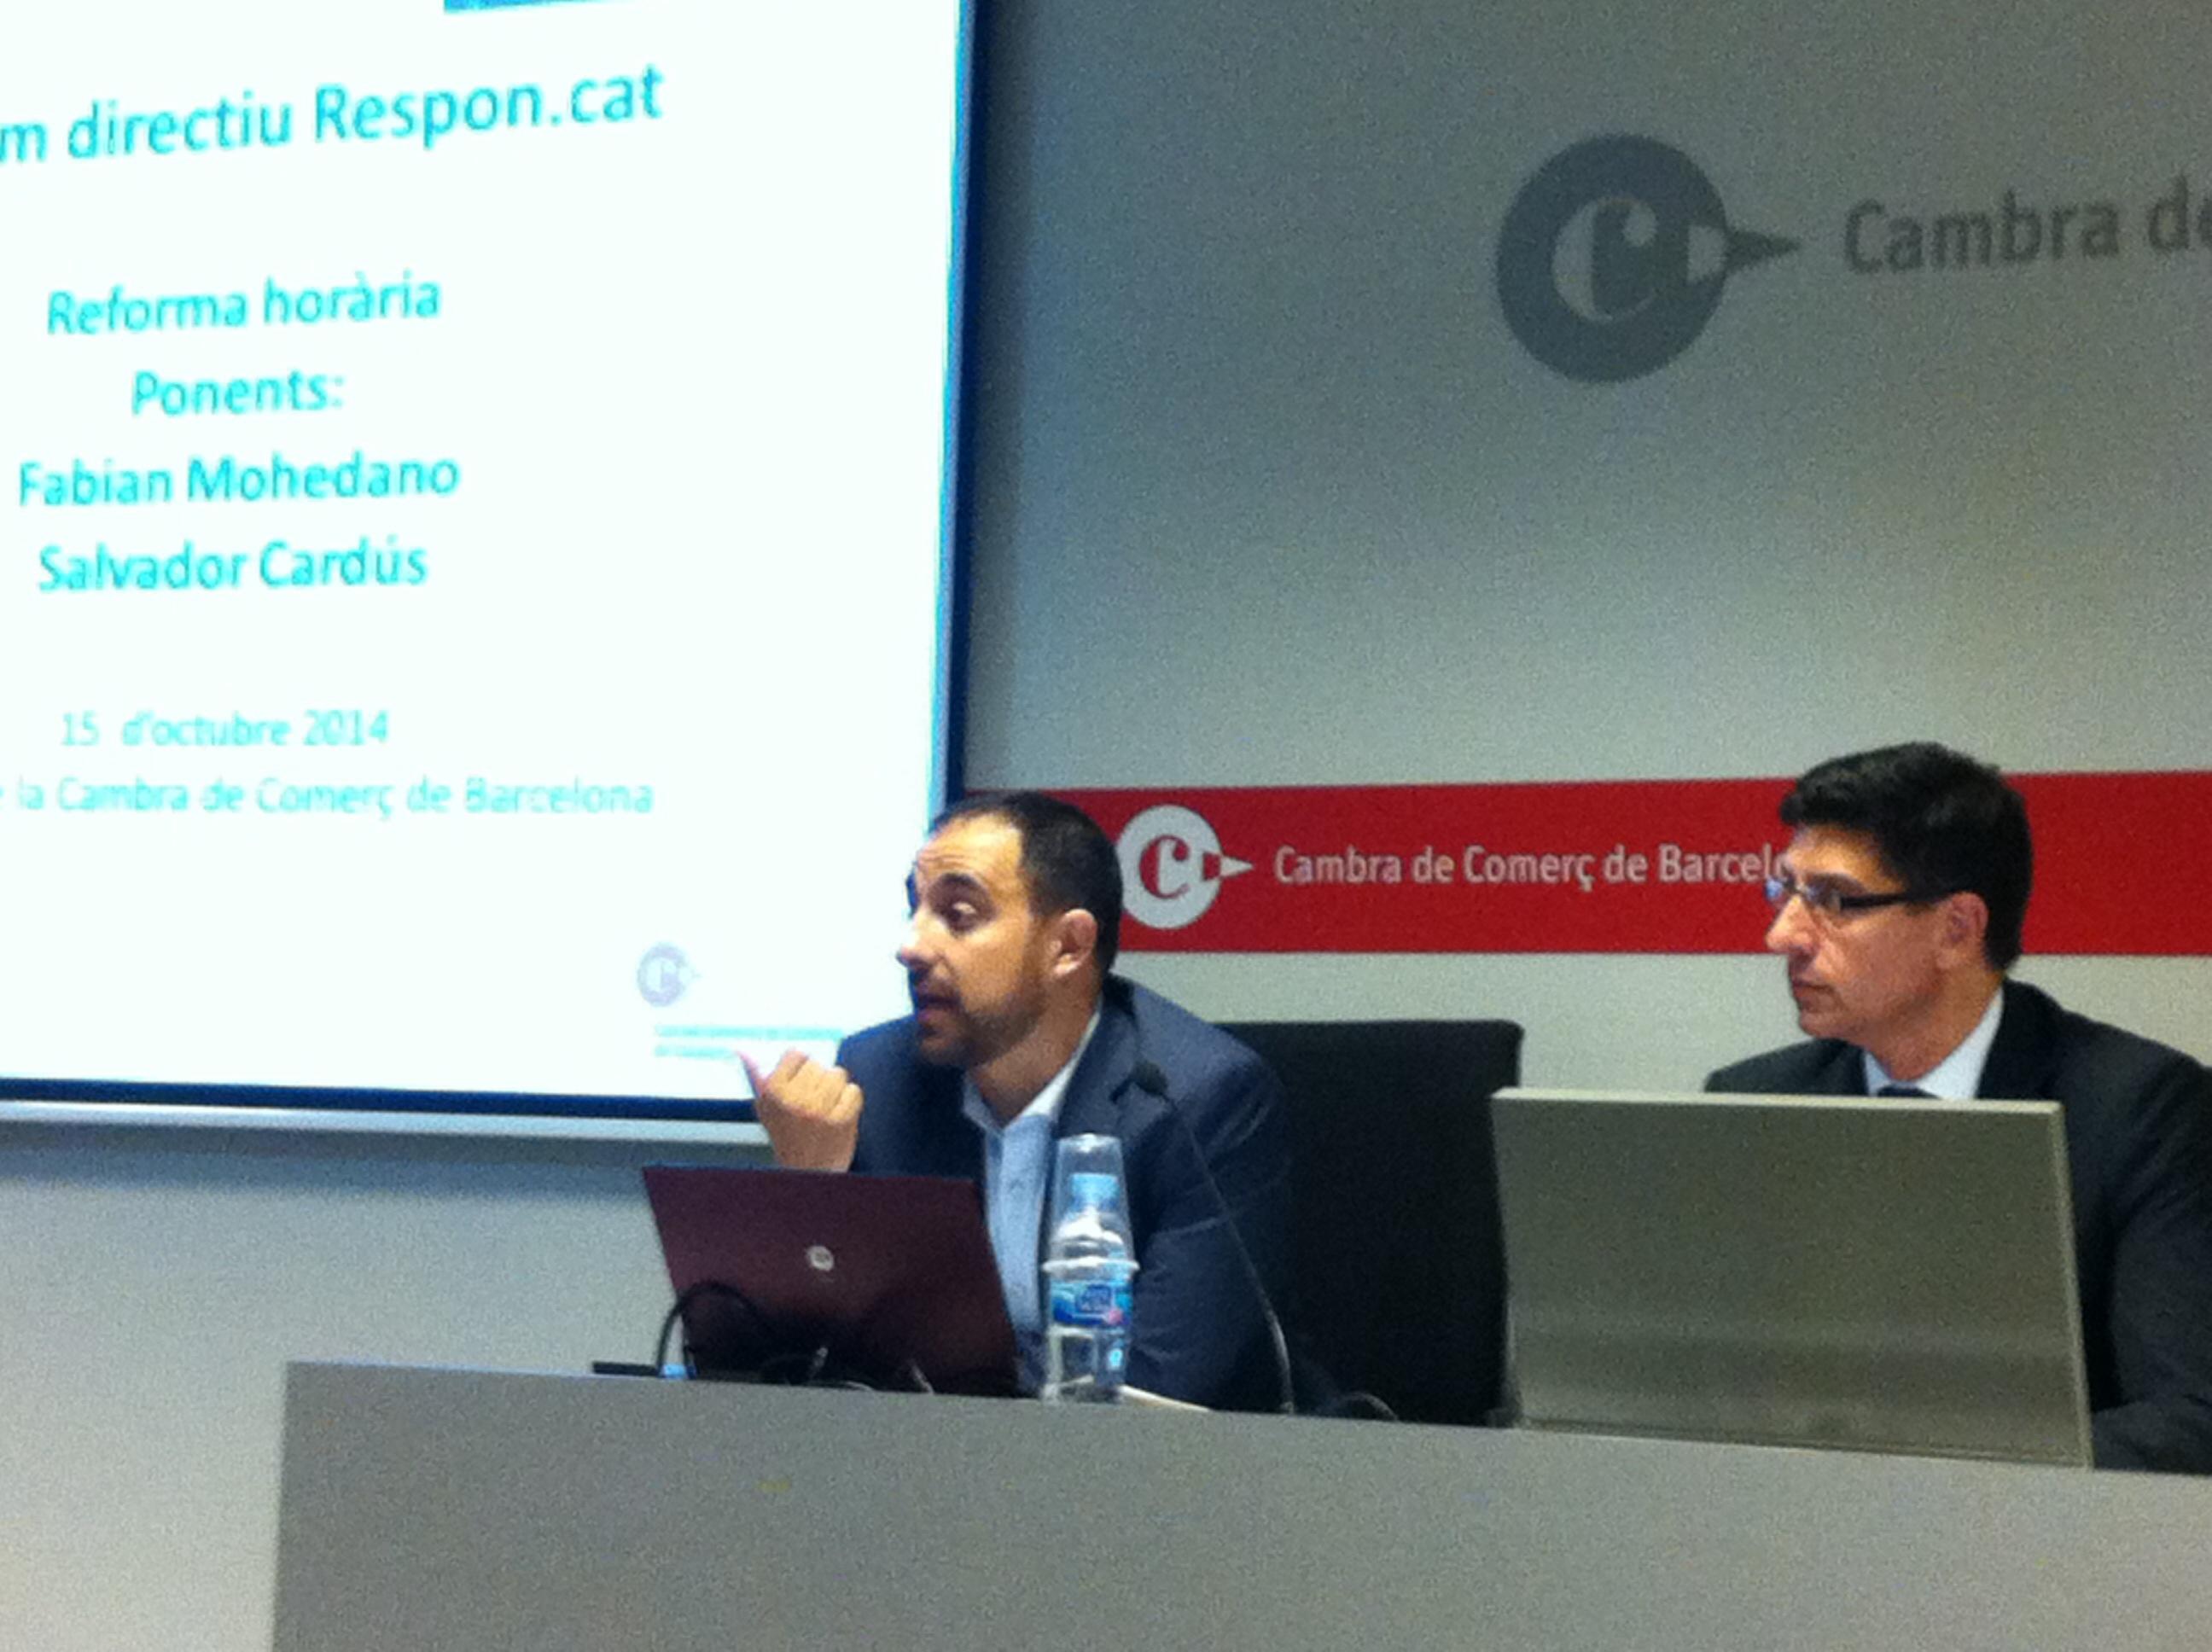 Fabian_Mohedano_Respon.cat